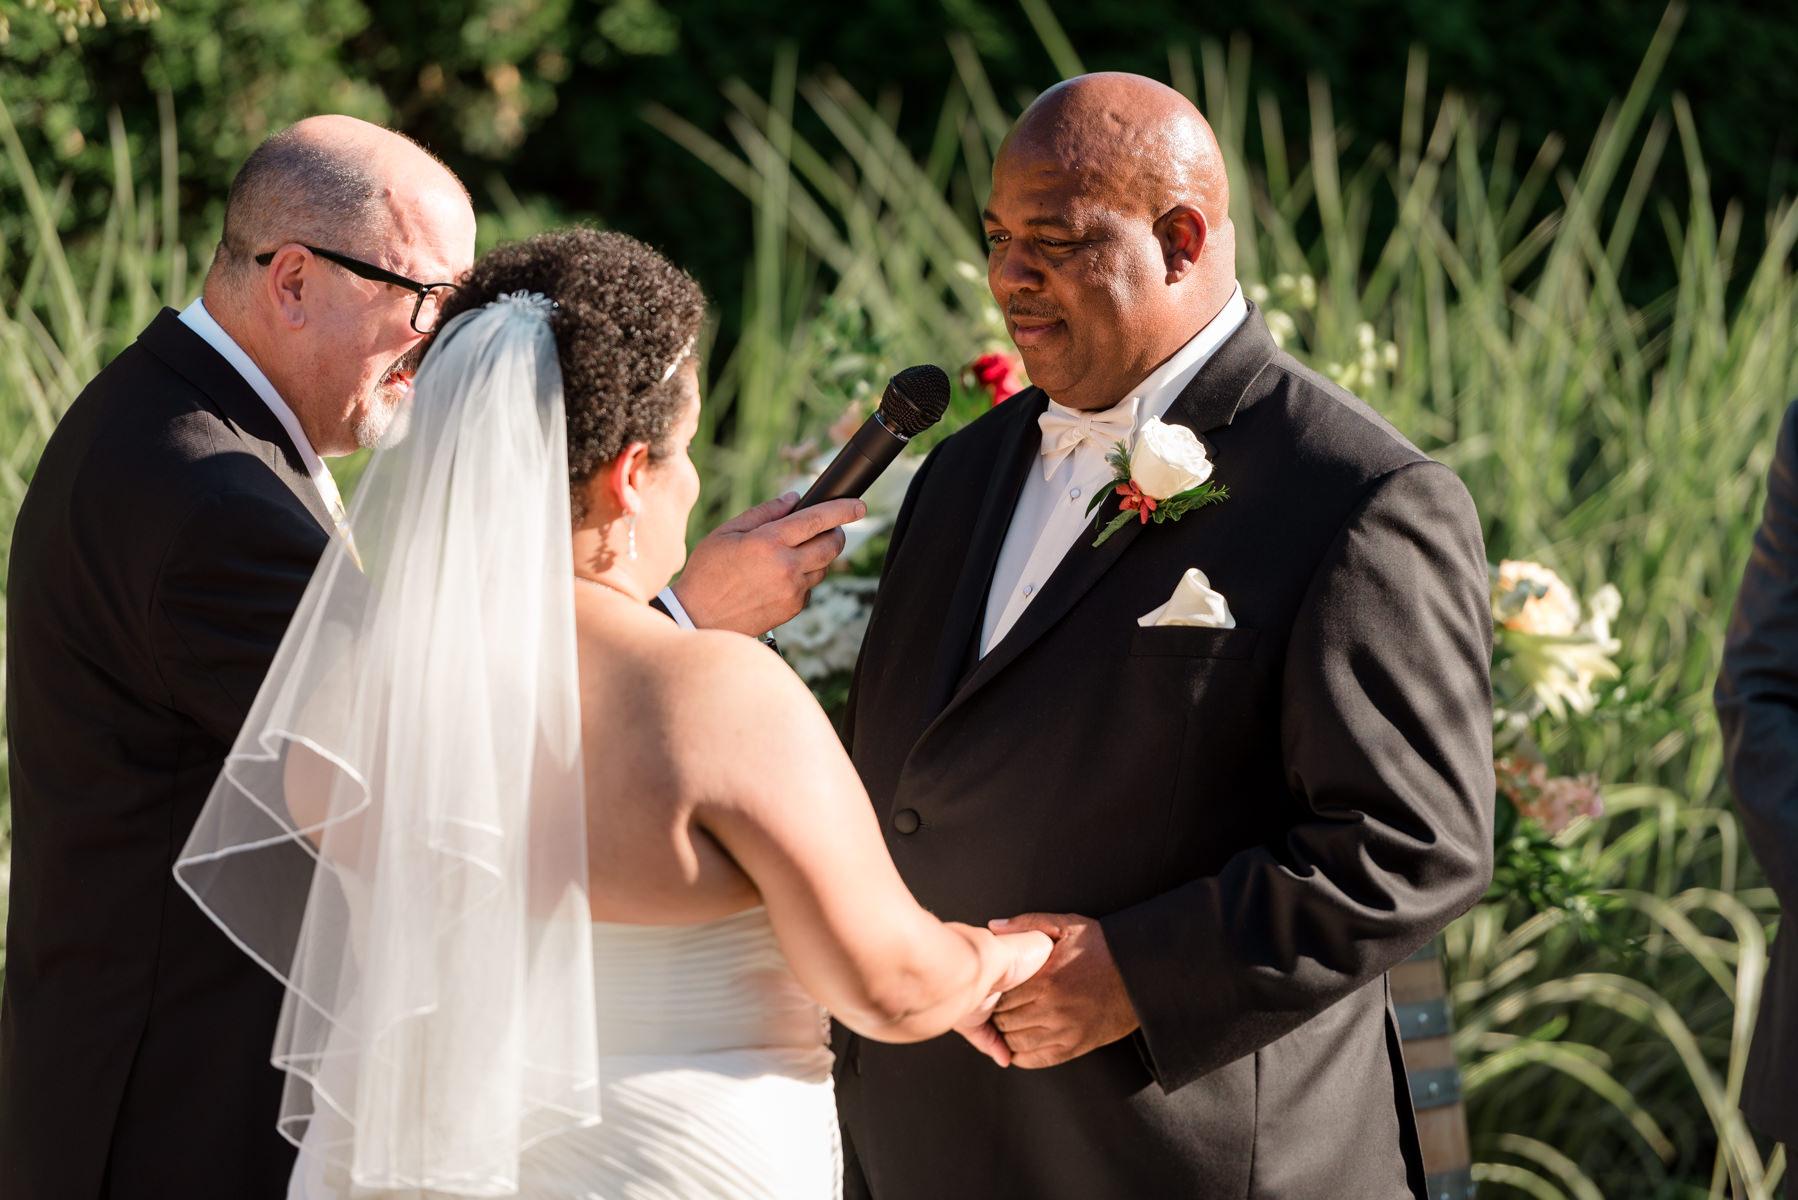 Andrew Tat - Documentary Wedding Photography - Columbia Winery - Woodinville, Washington -Patricia & Teffin - 12.jpg